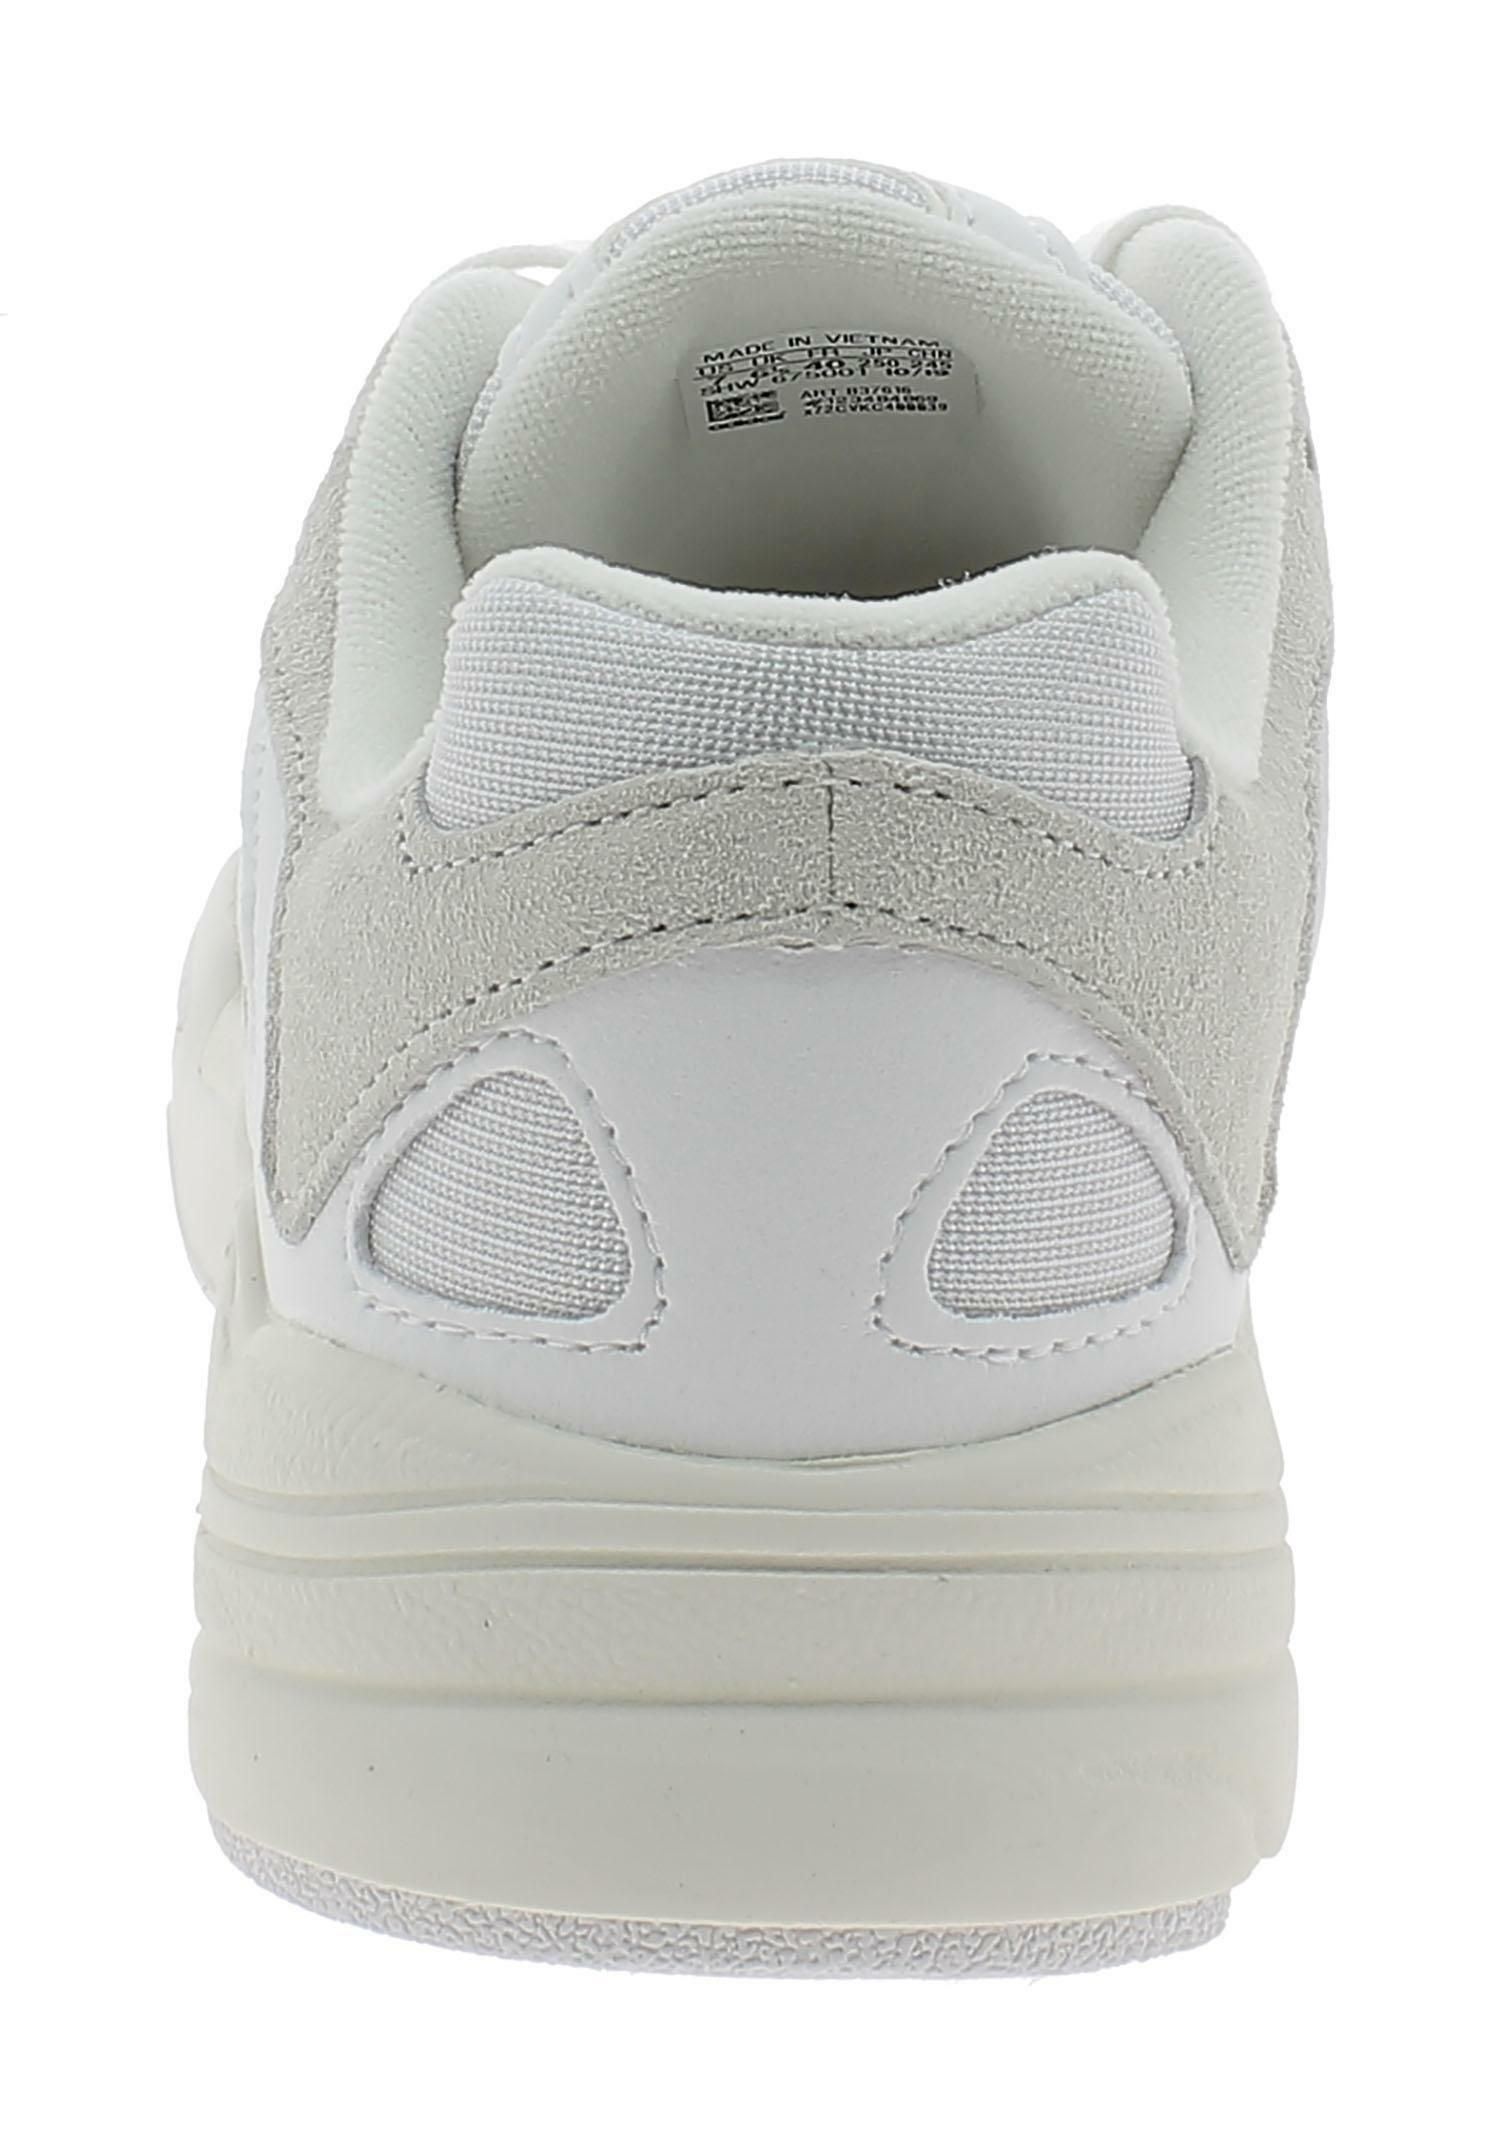 adidas adidas yung-1 scarpe sportive bambino bianche b37616